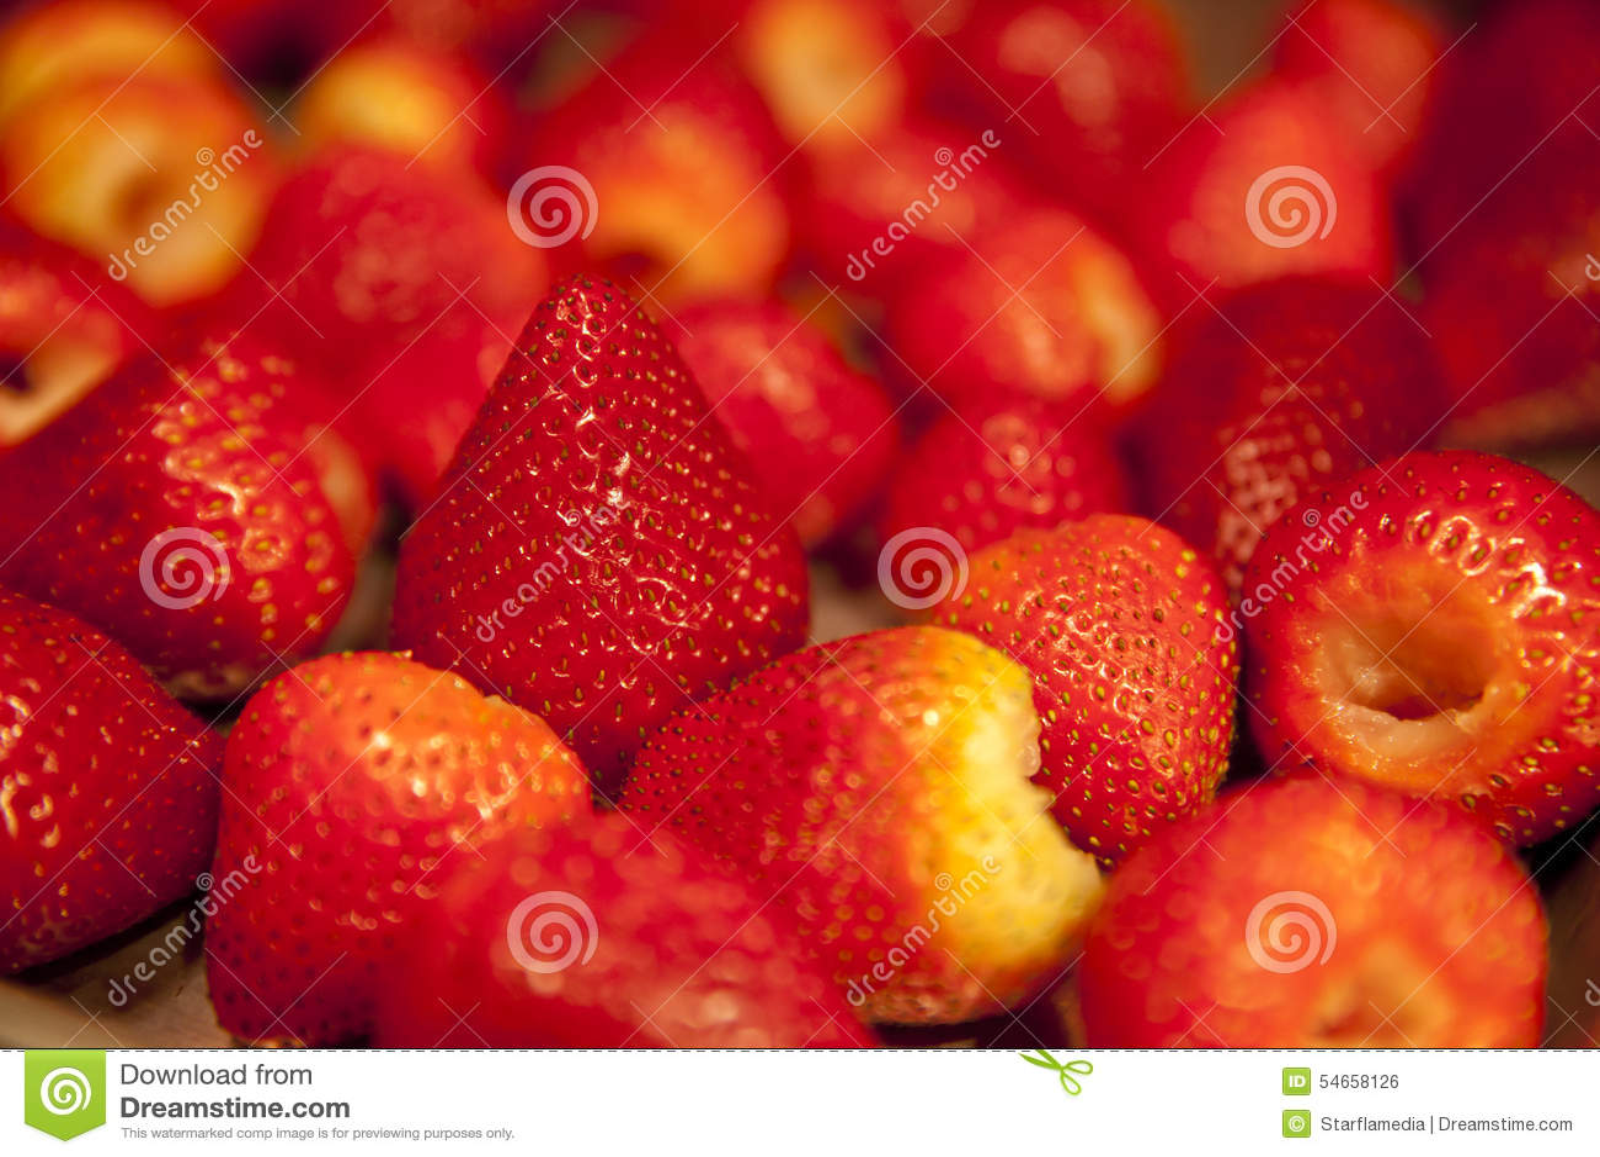 Strawberry Pose